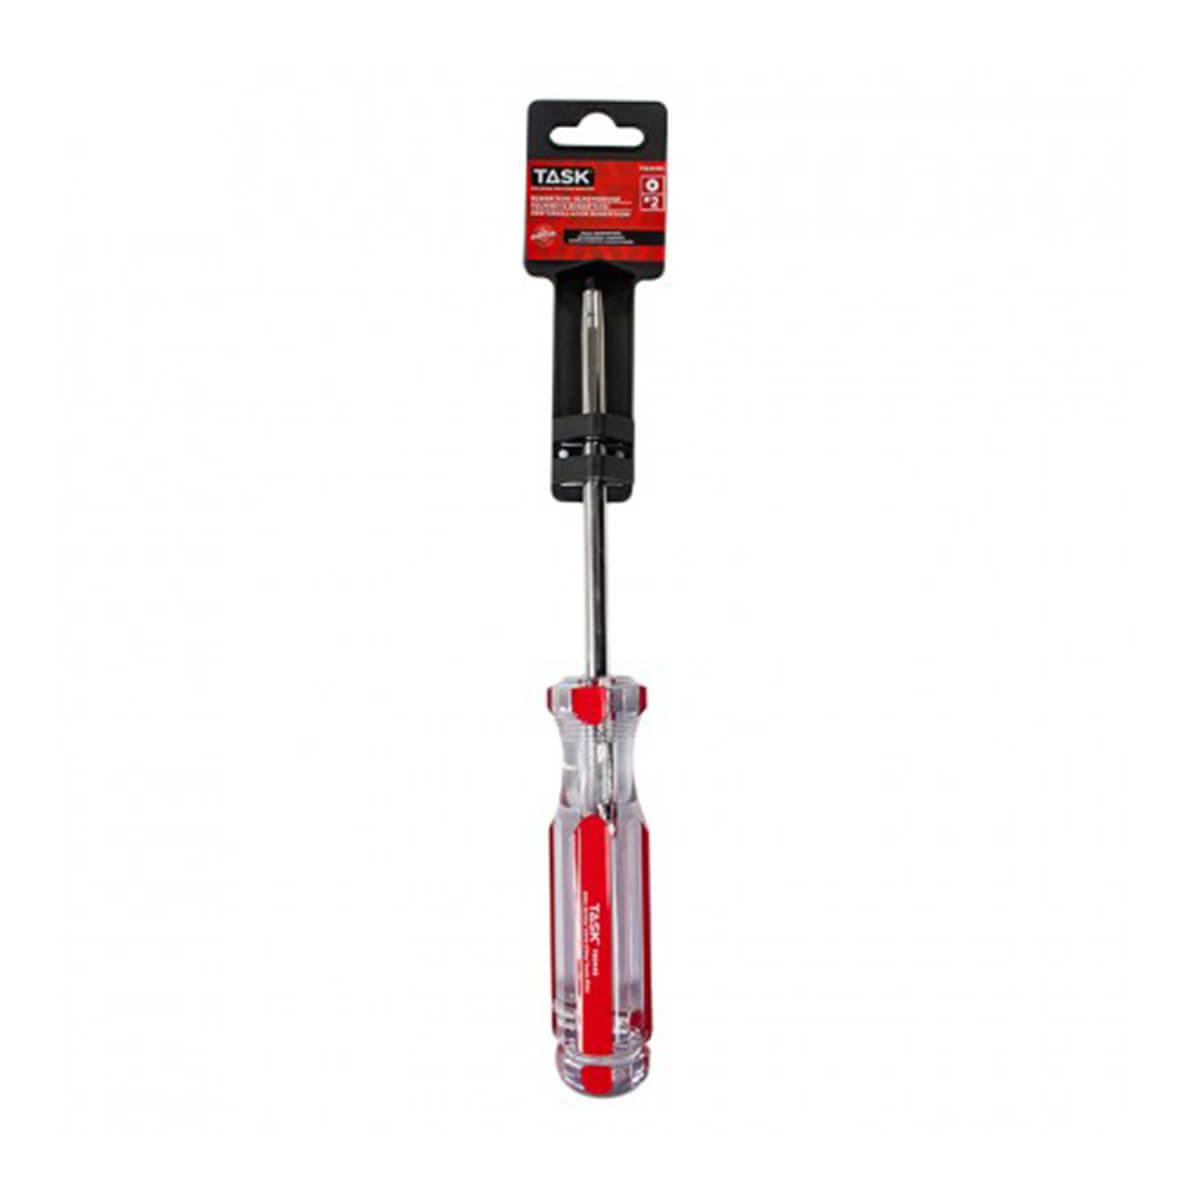 #2 Robertson® 5 in Elite Acetate Hard Grip Screwdriver